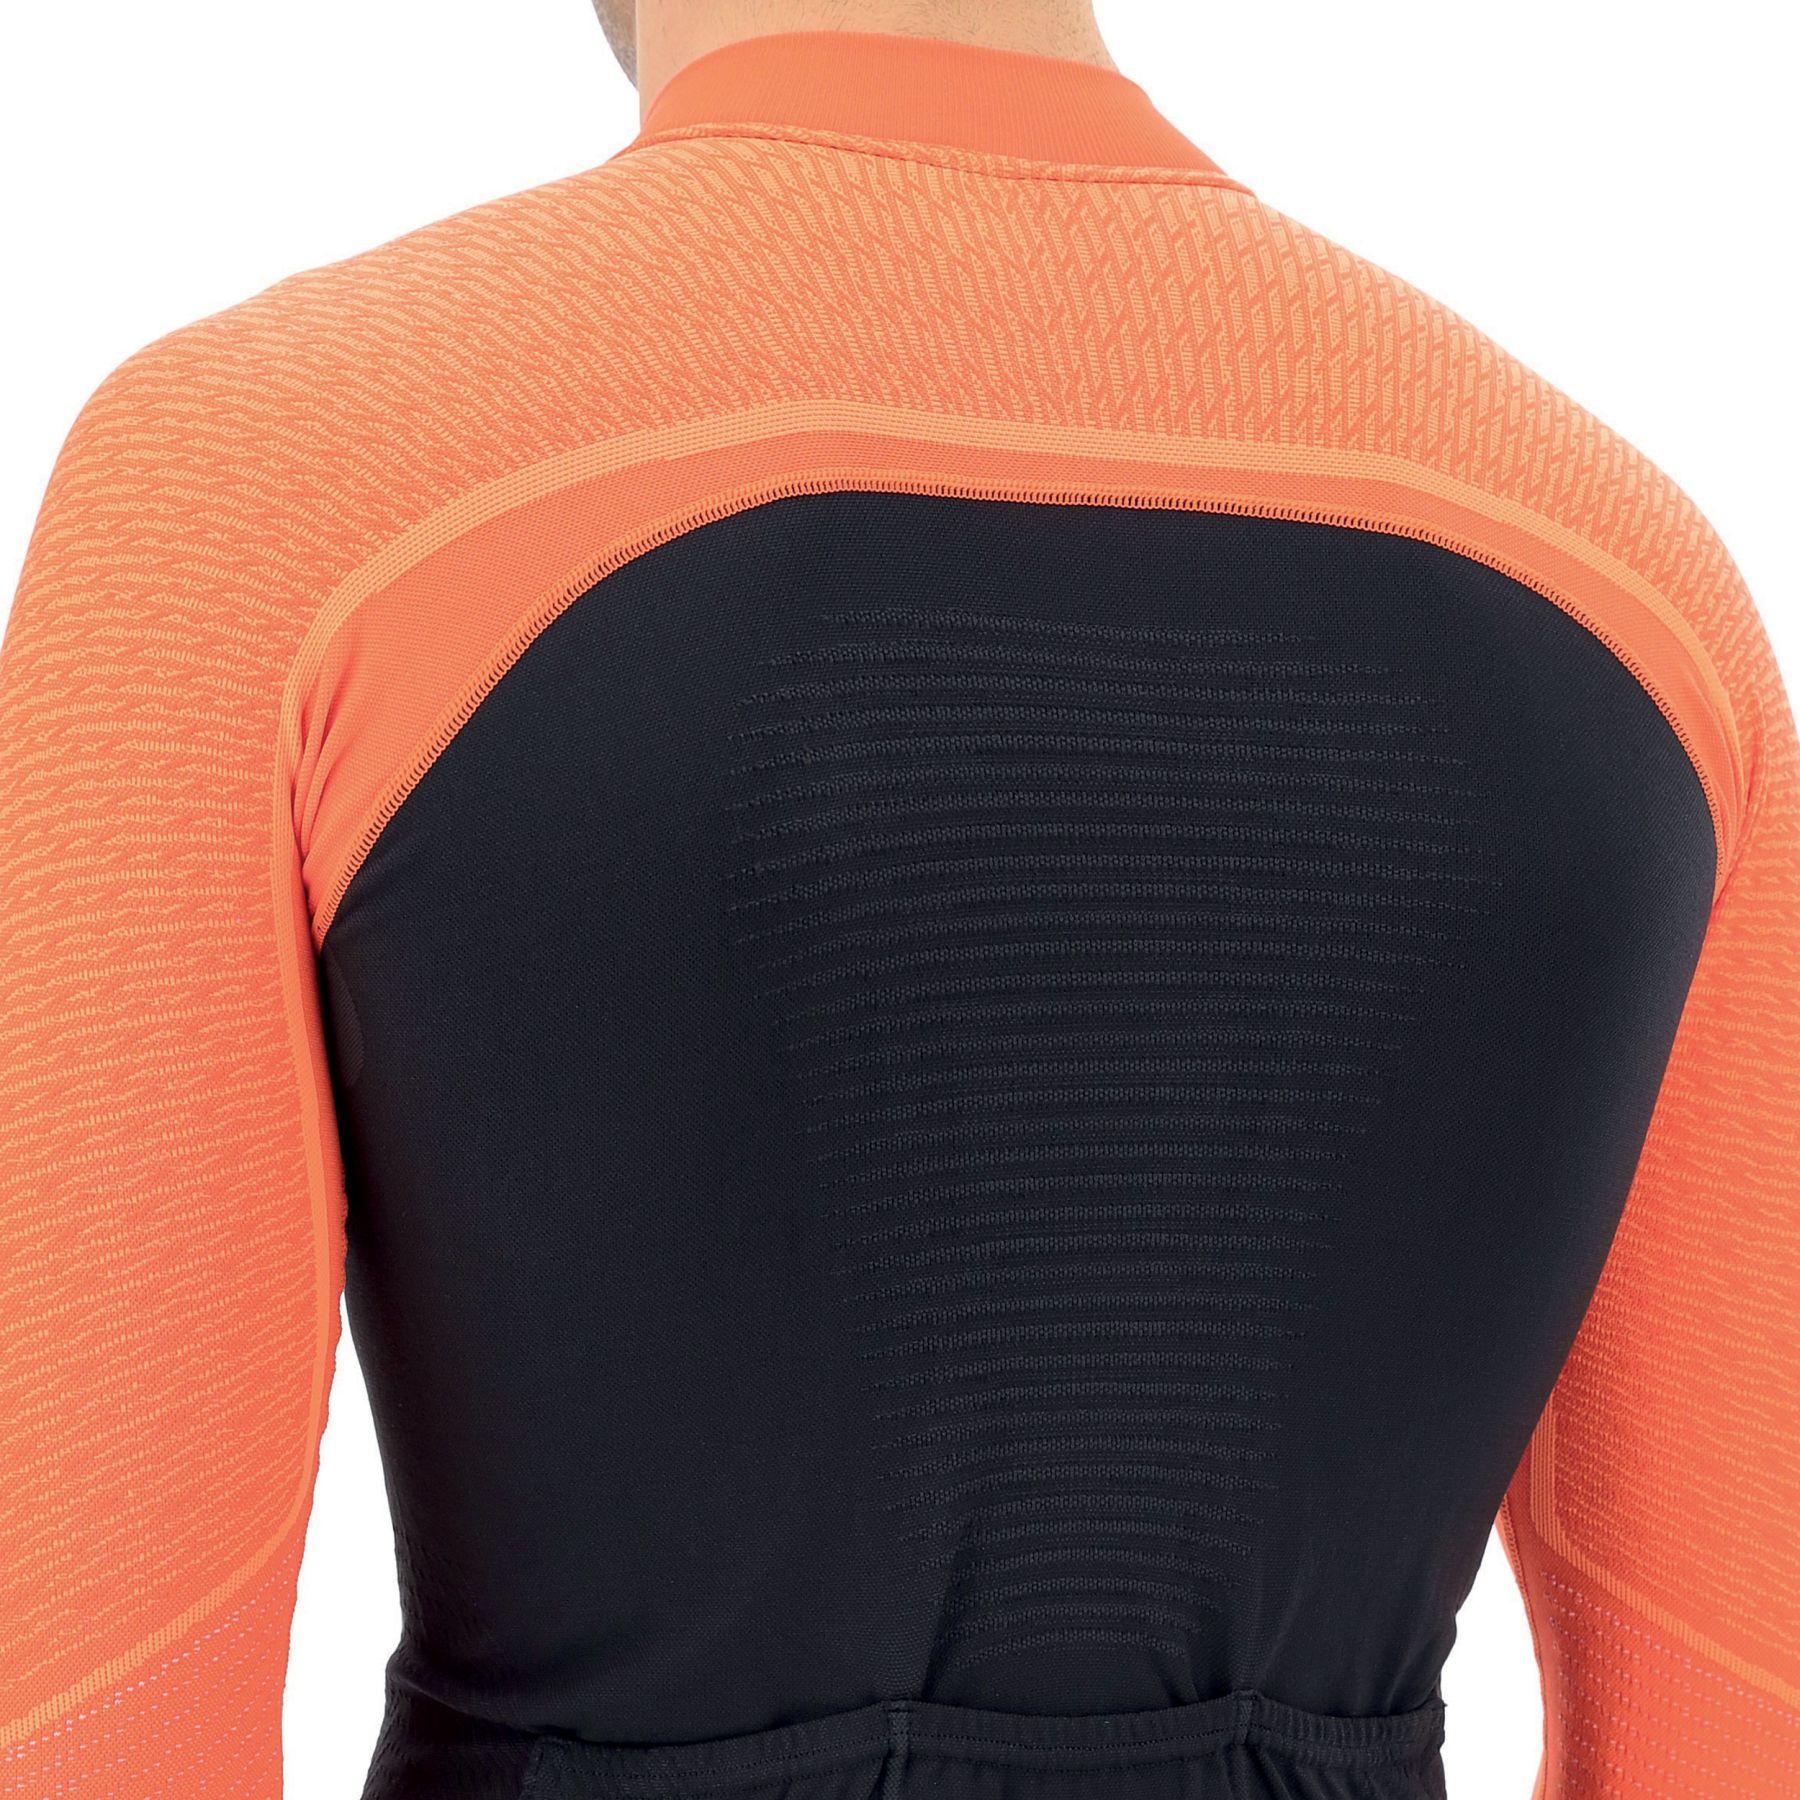 Image of UYN Biking Granfondo Long Sleeve Jersey - Blackboard/Ibis